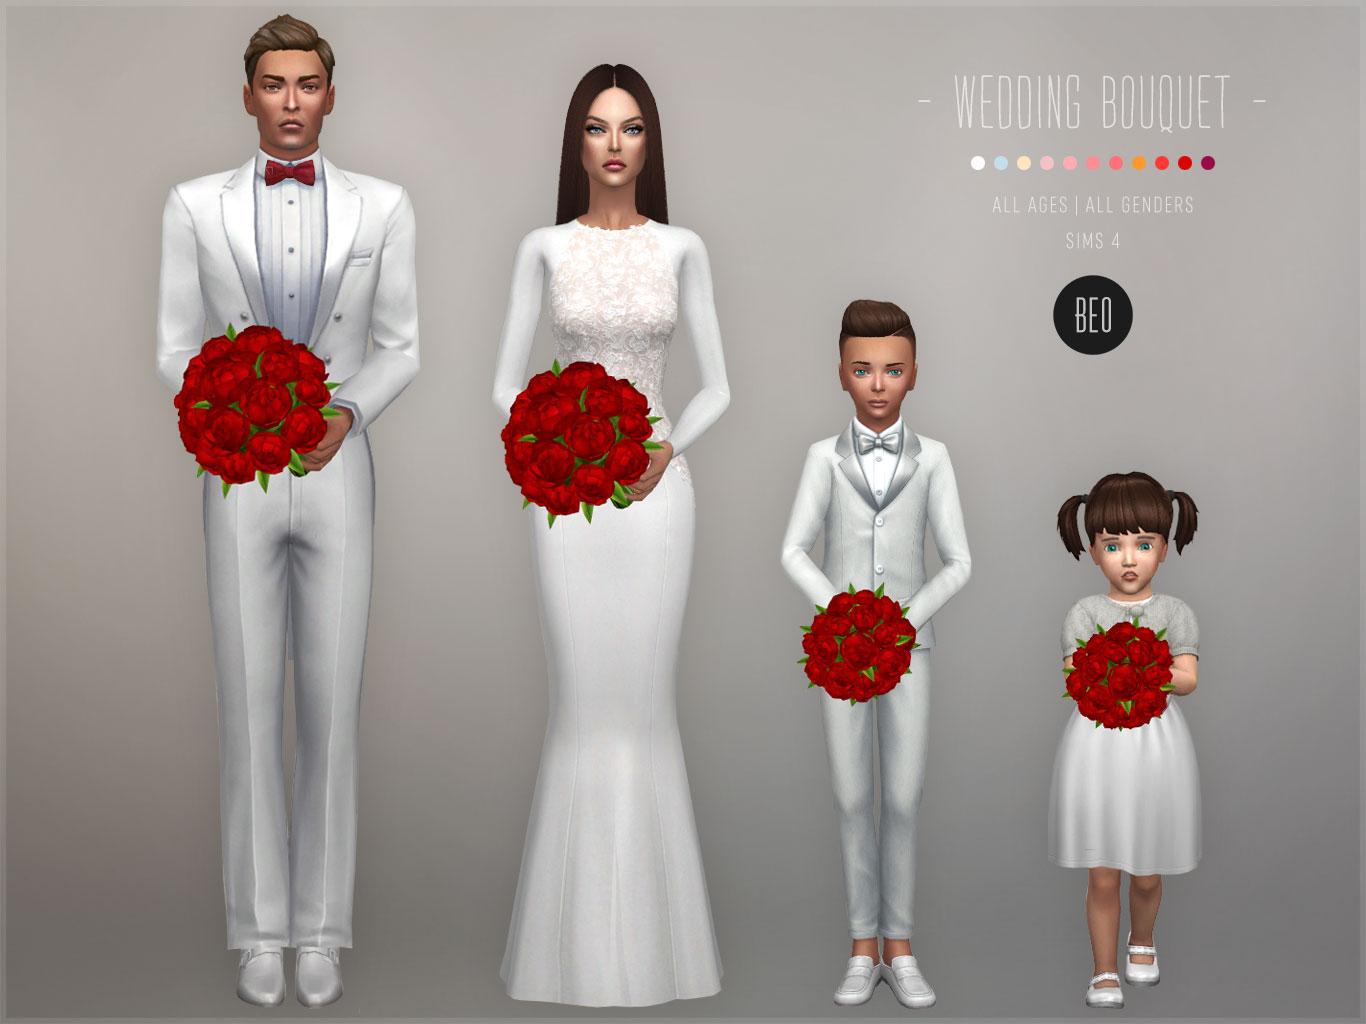 Sims 4 Wedding Veil.Beo Creations